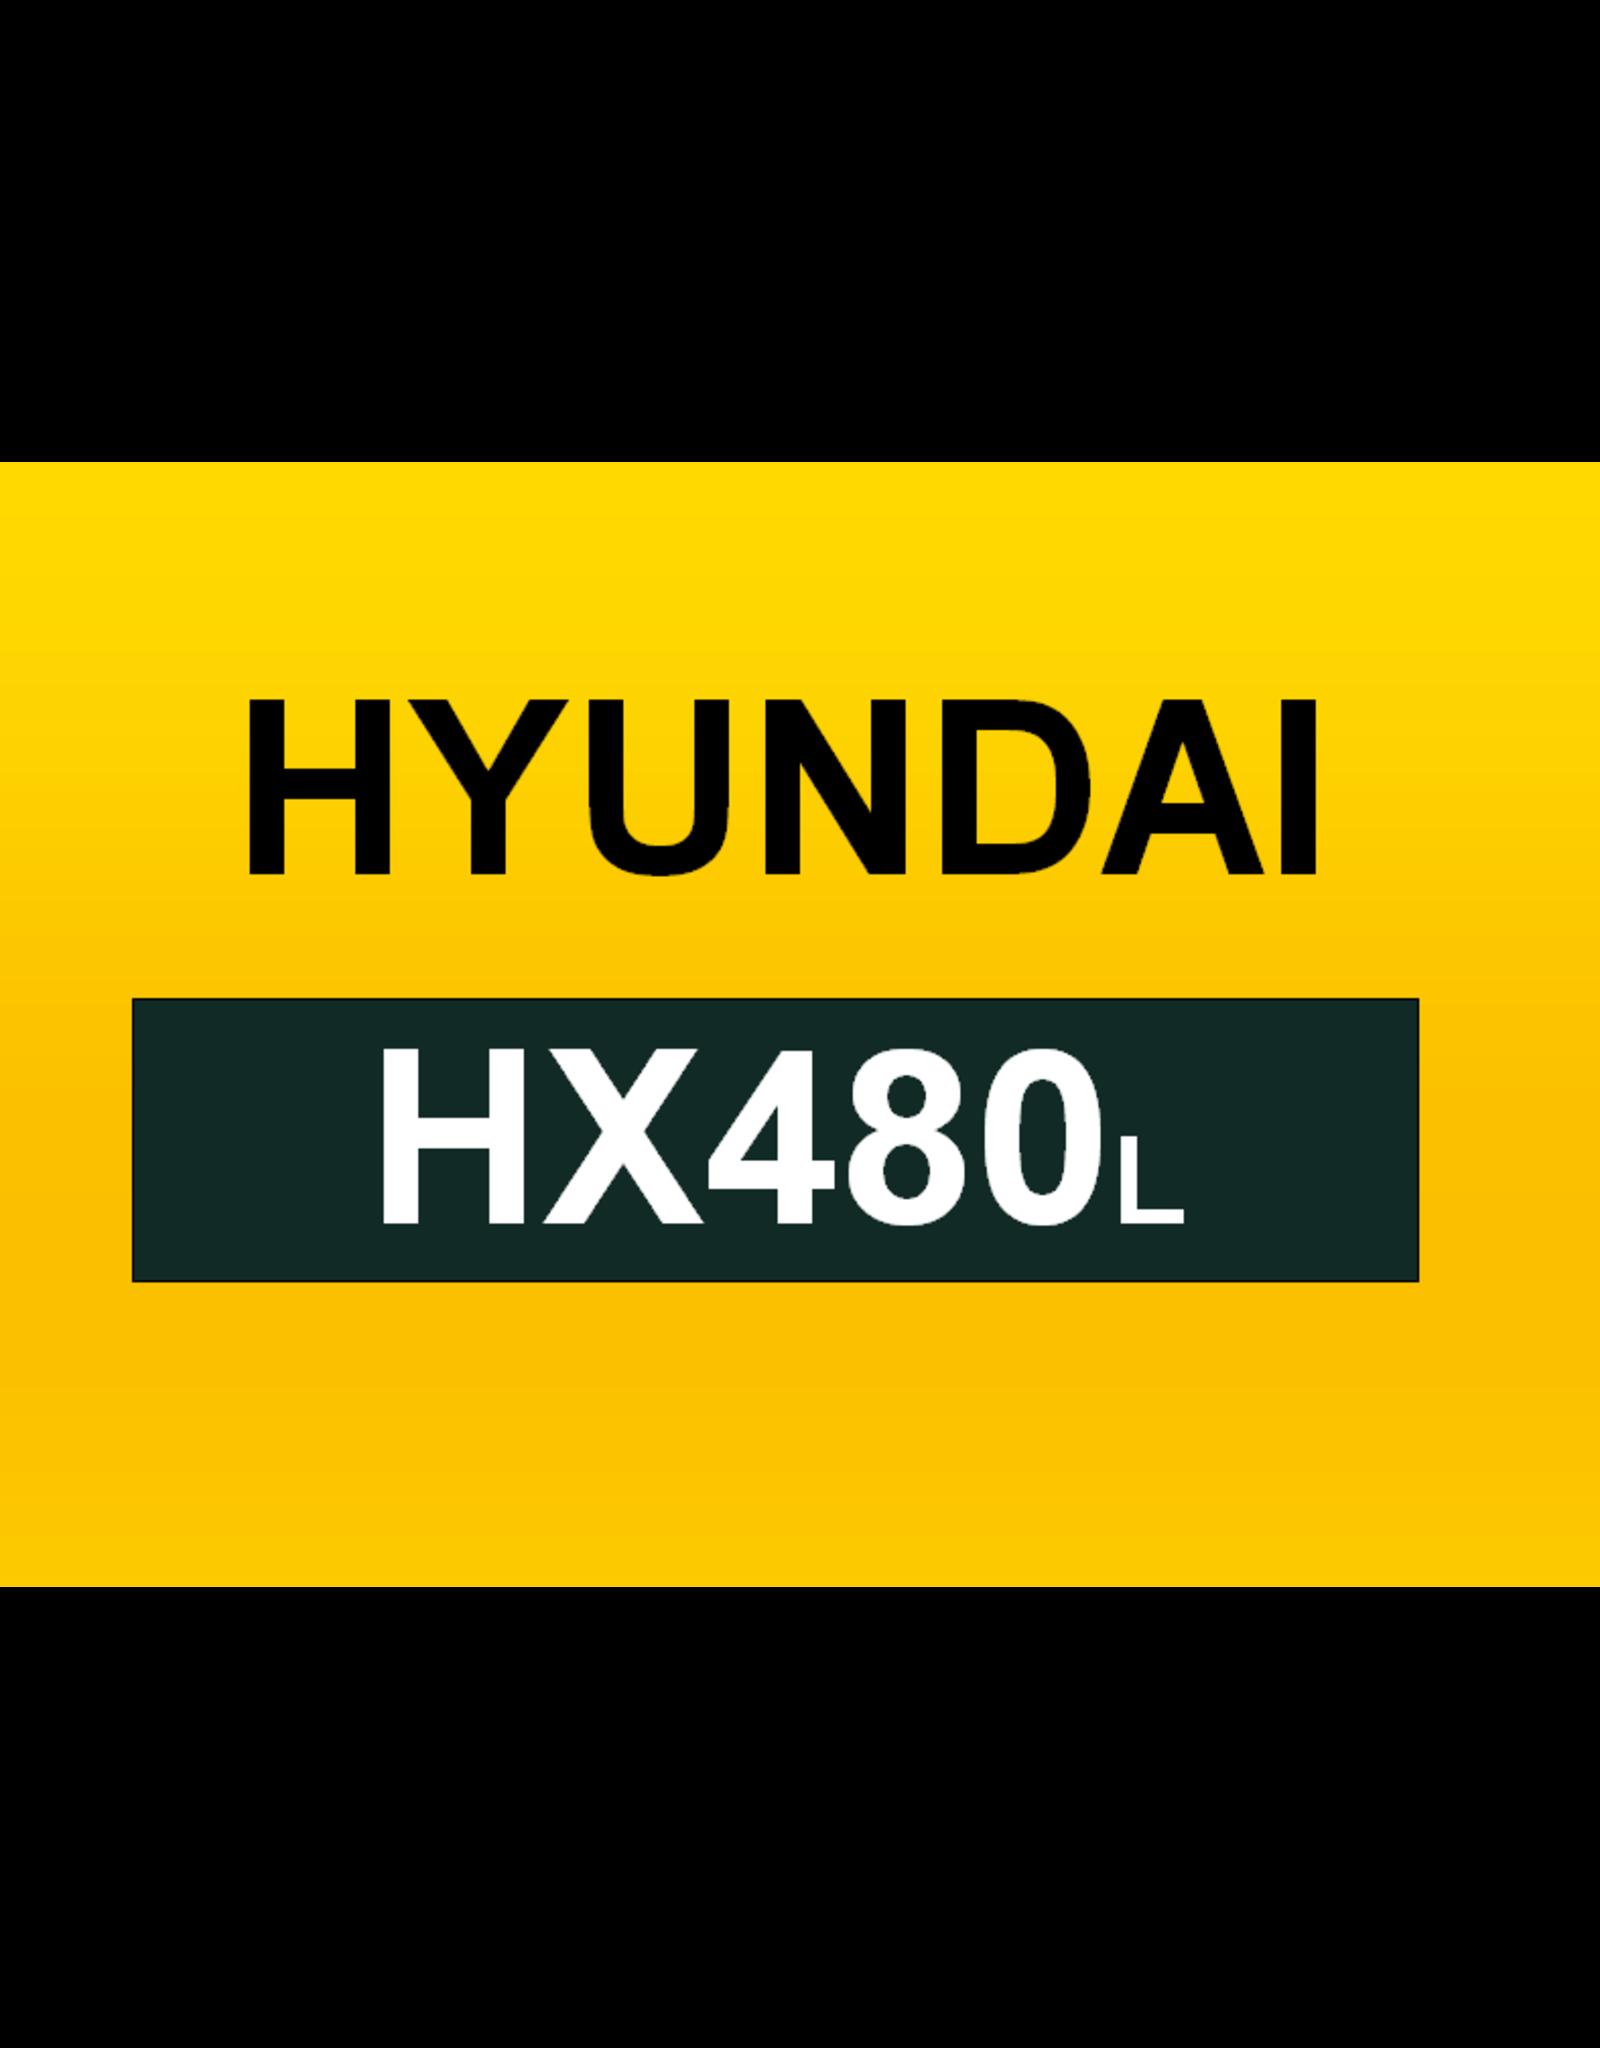 Echle Hartstahl GmbH FOPS for Hyundai HX480L